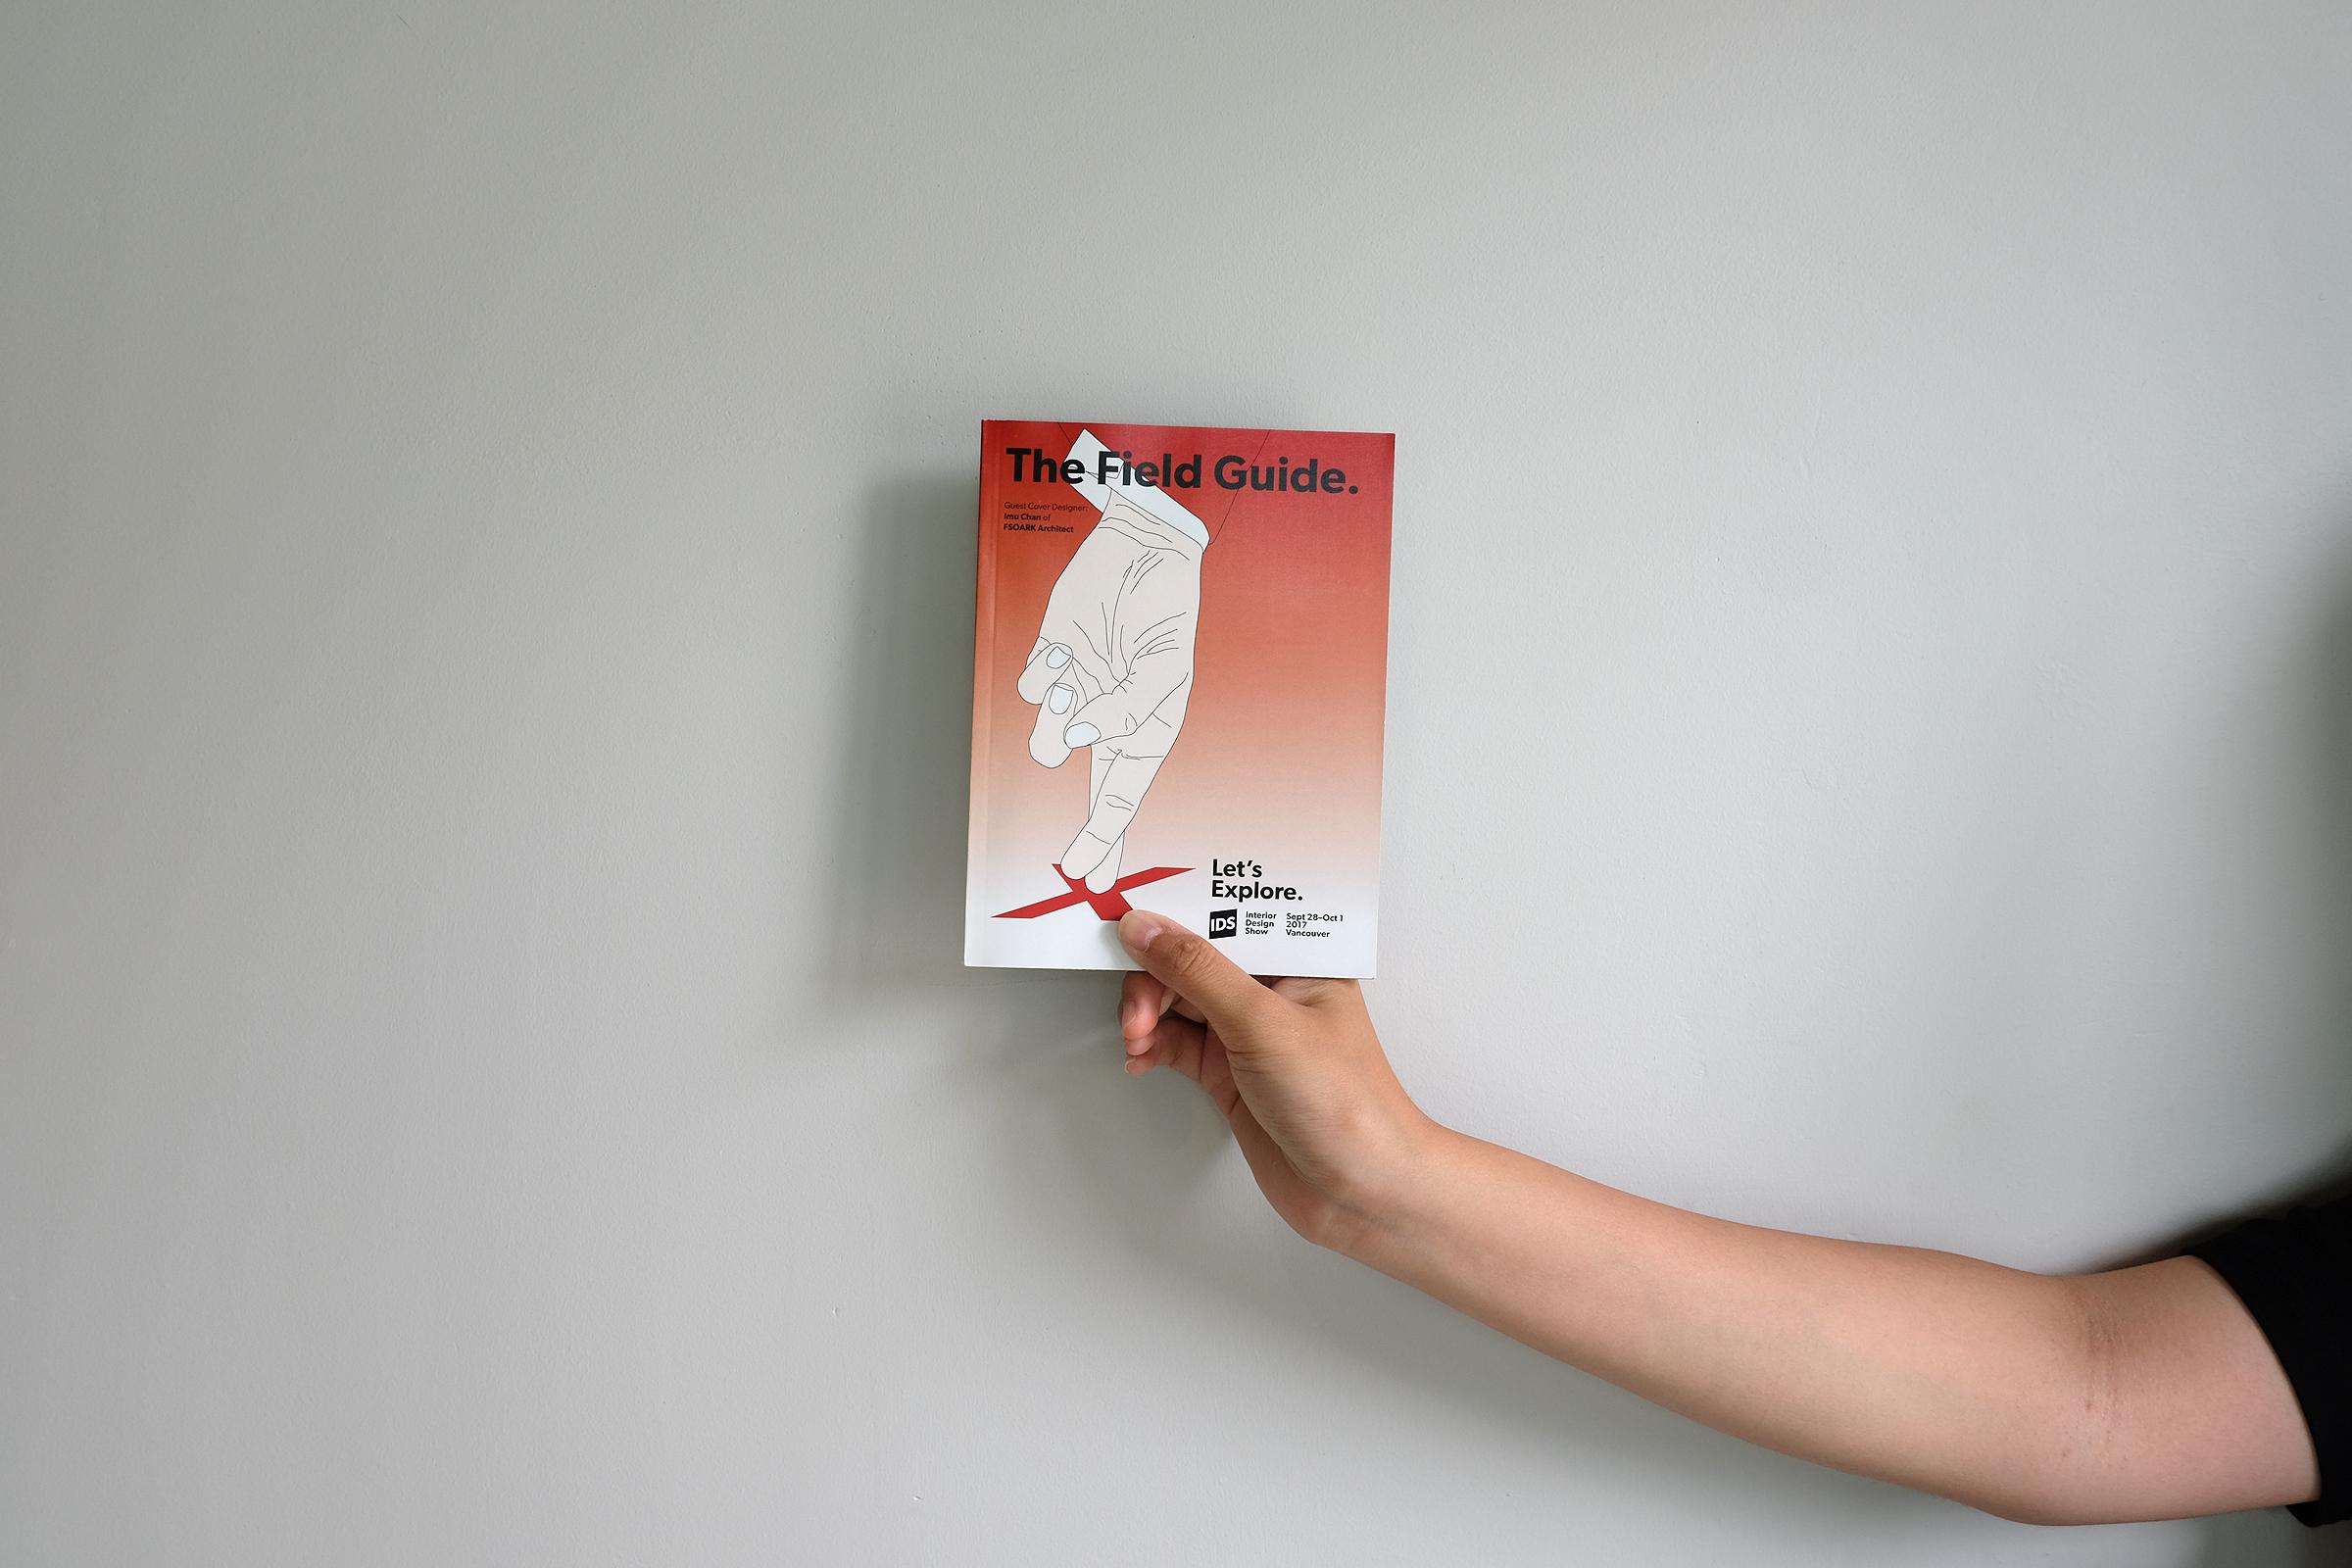 FSOARK-Tokyo X Field Guide Book Design-2400x1600.jpg